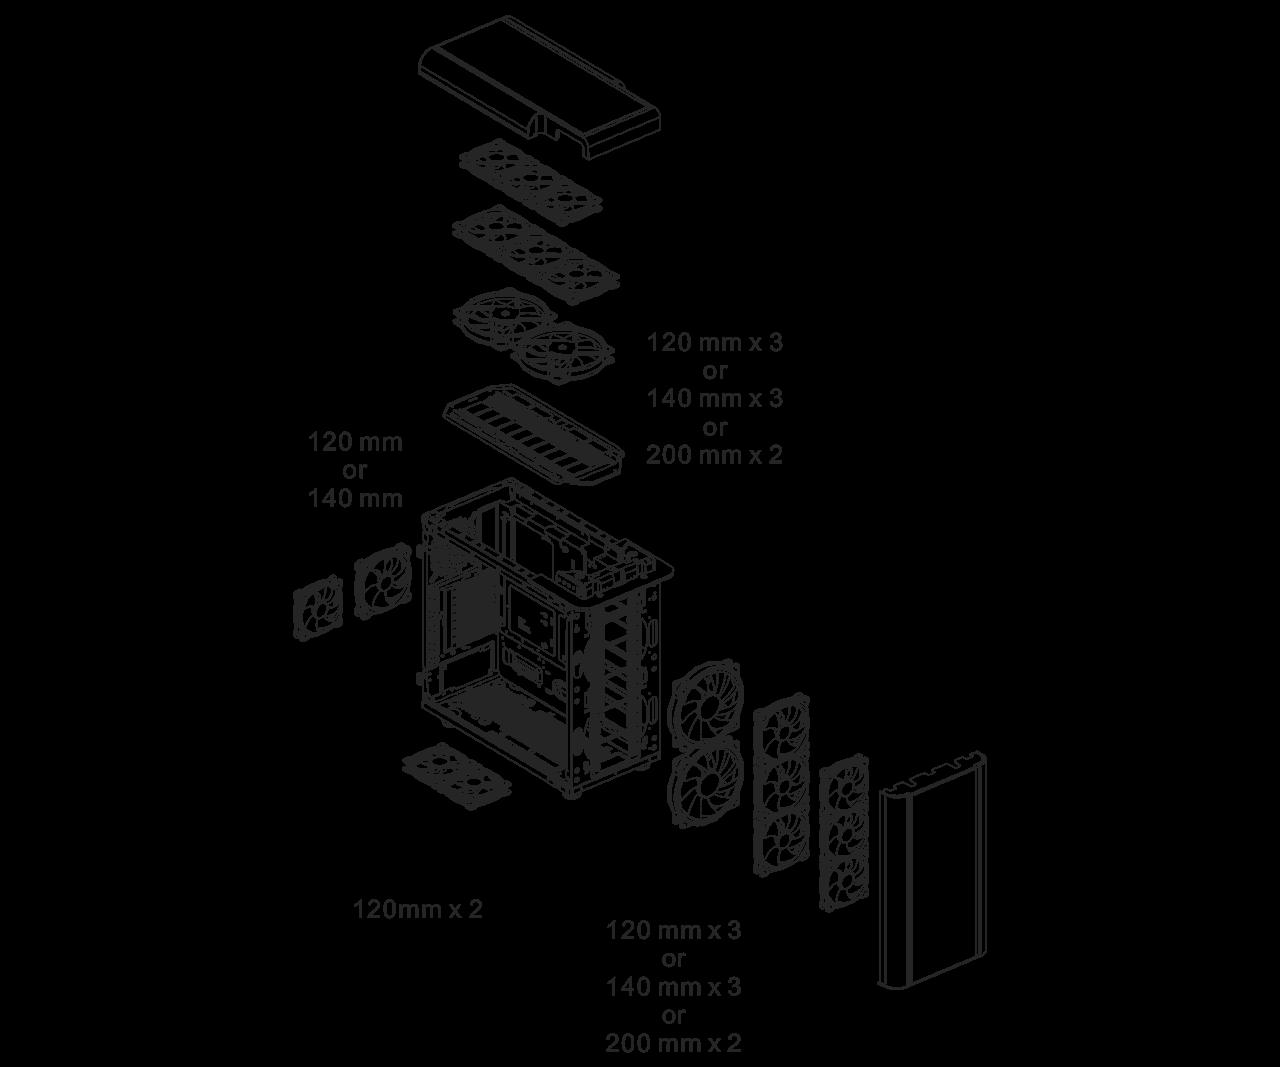 Case Thermaltake Level 20 GT ARGB Black Edition